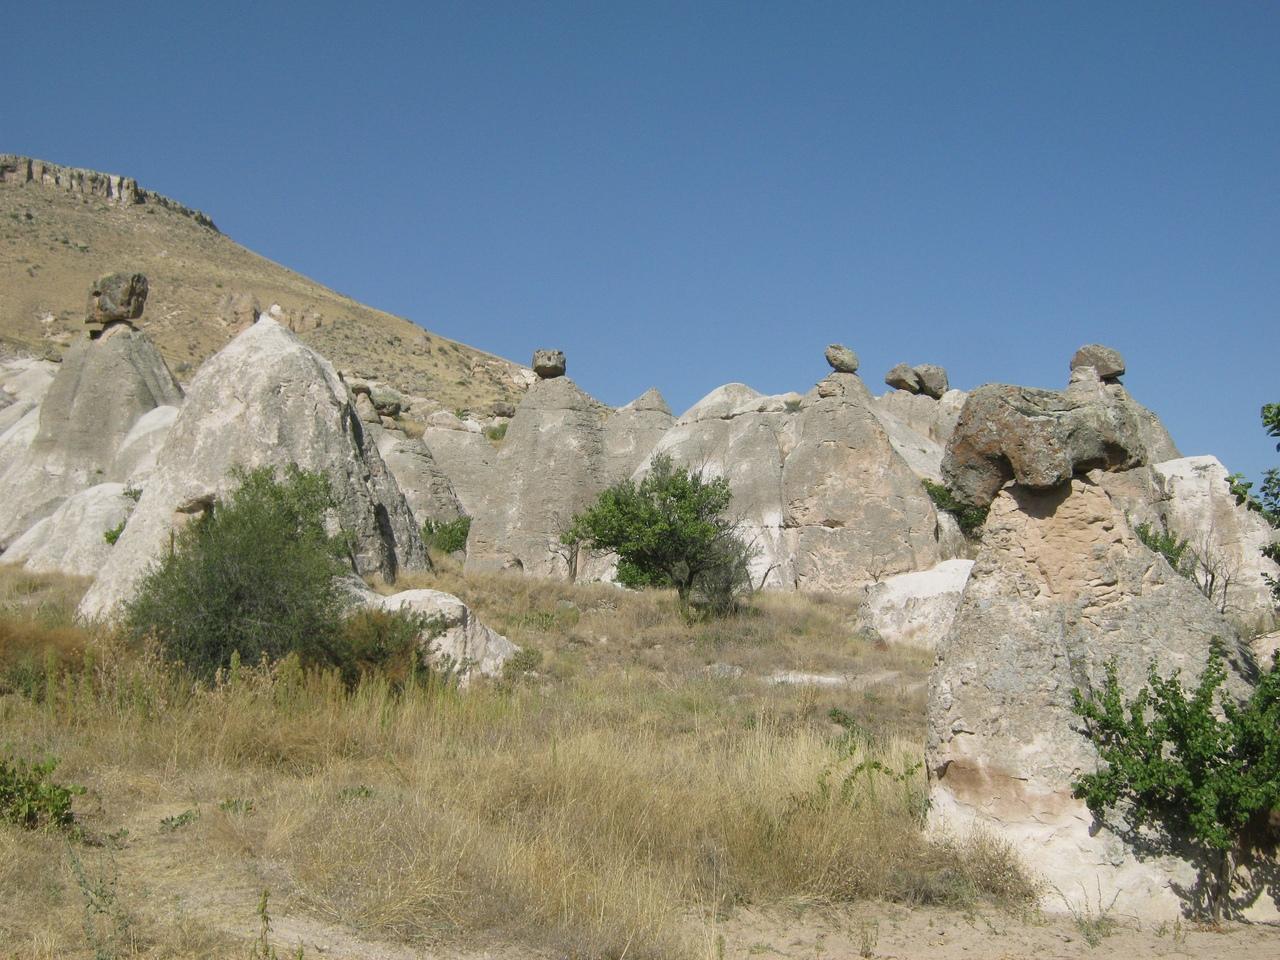 столбы со шляпками в Каппадокии